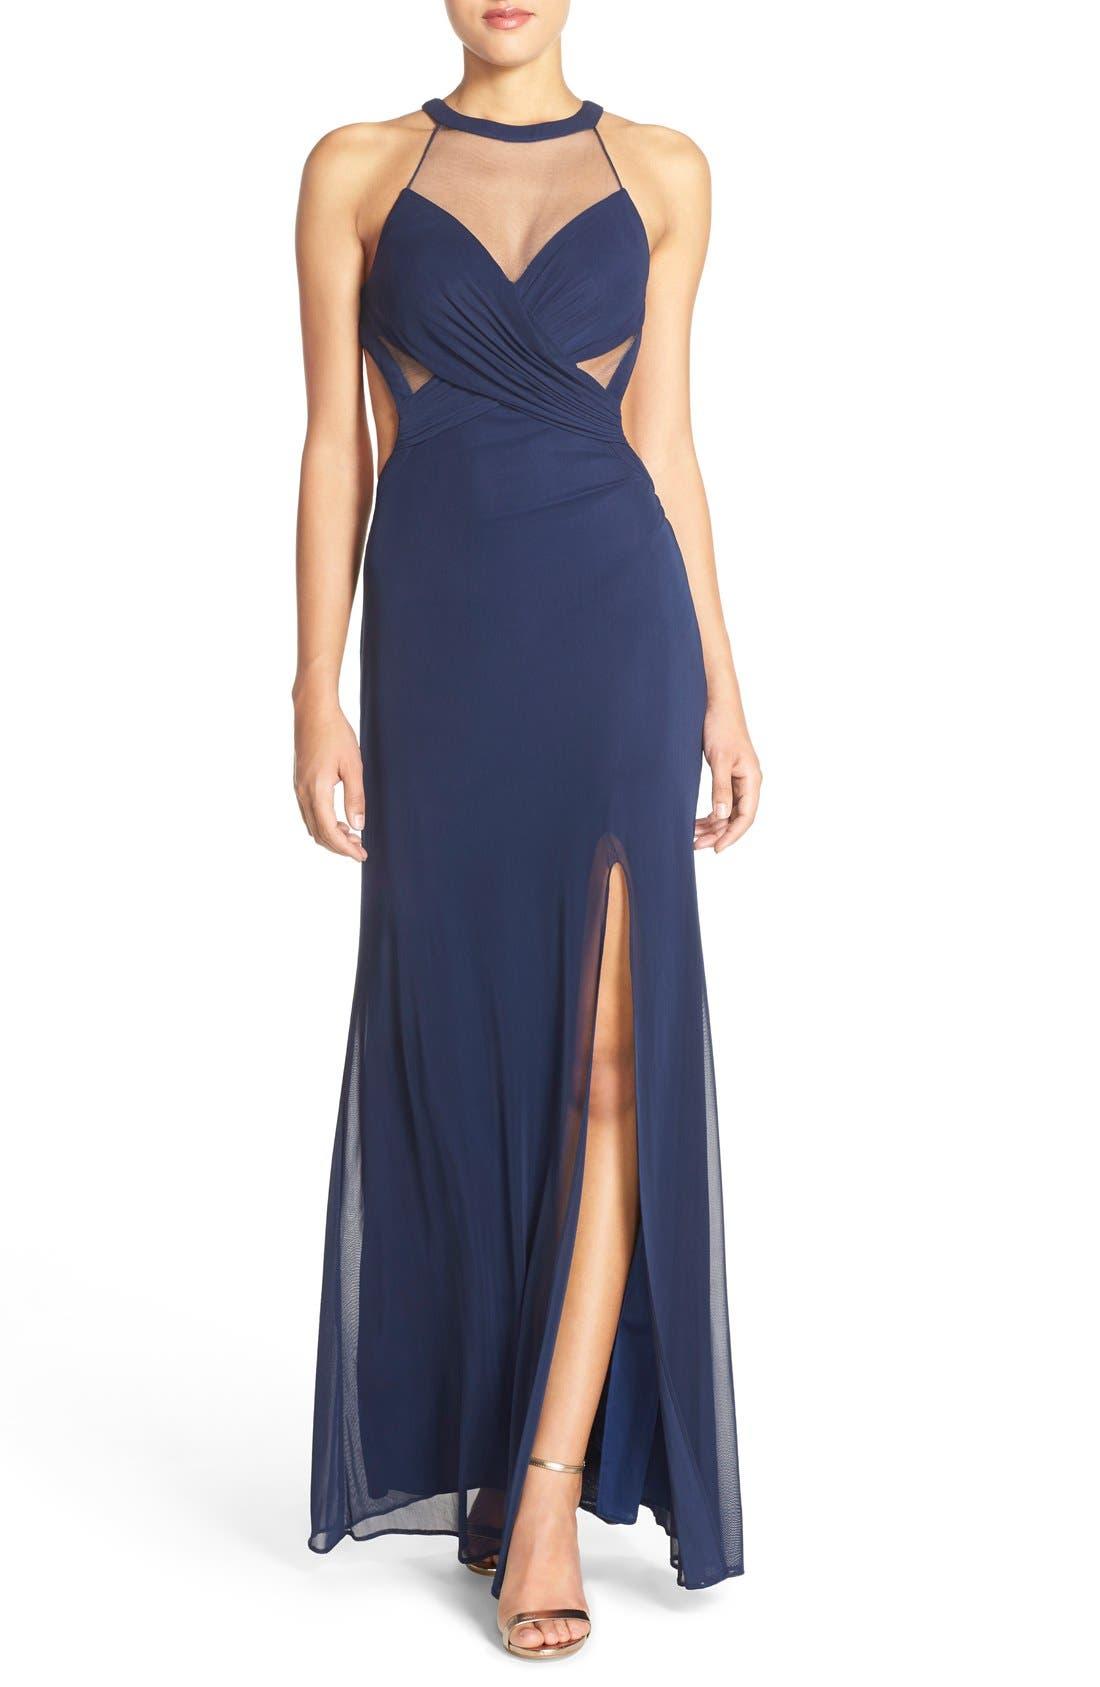 Alternate Image 1 Selected - Abbi Von Cutout Net Jersey Gown